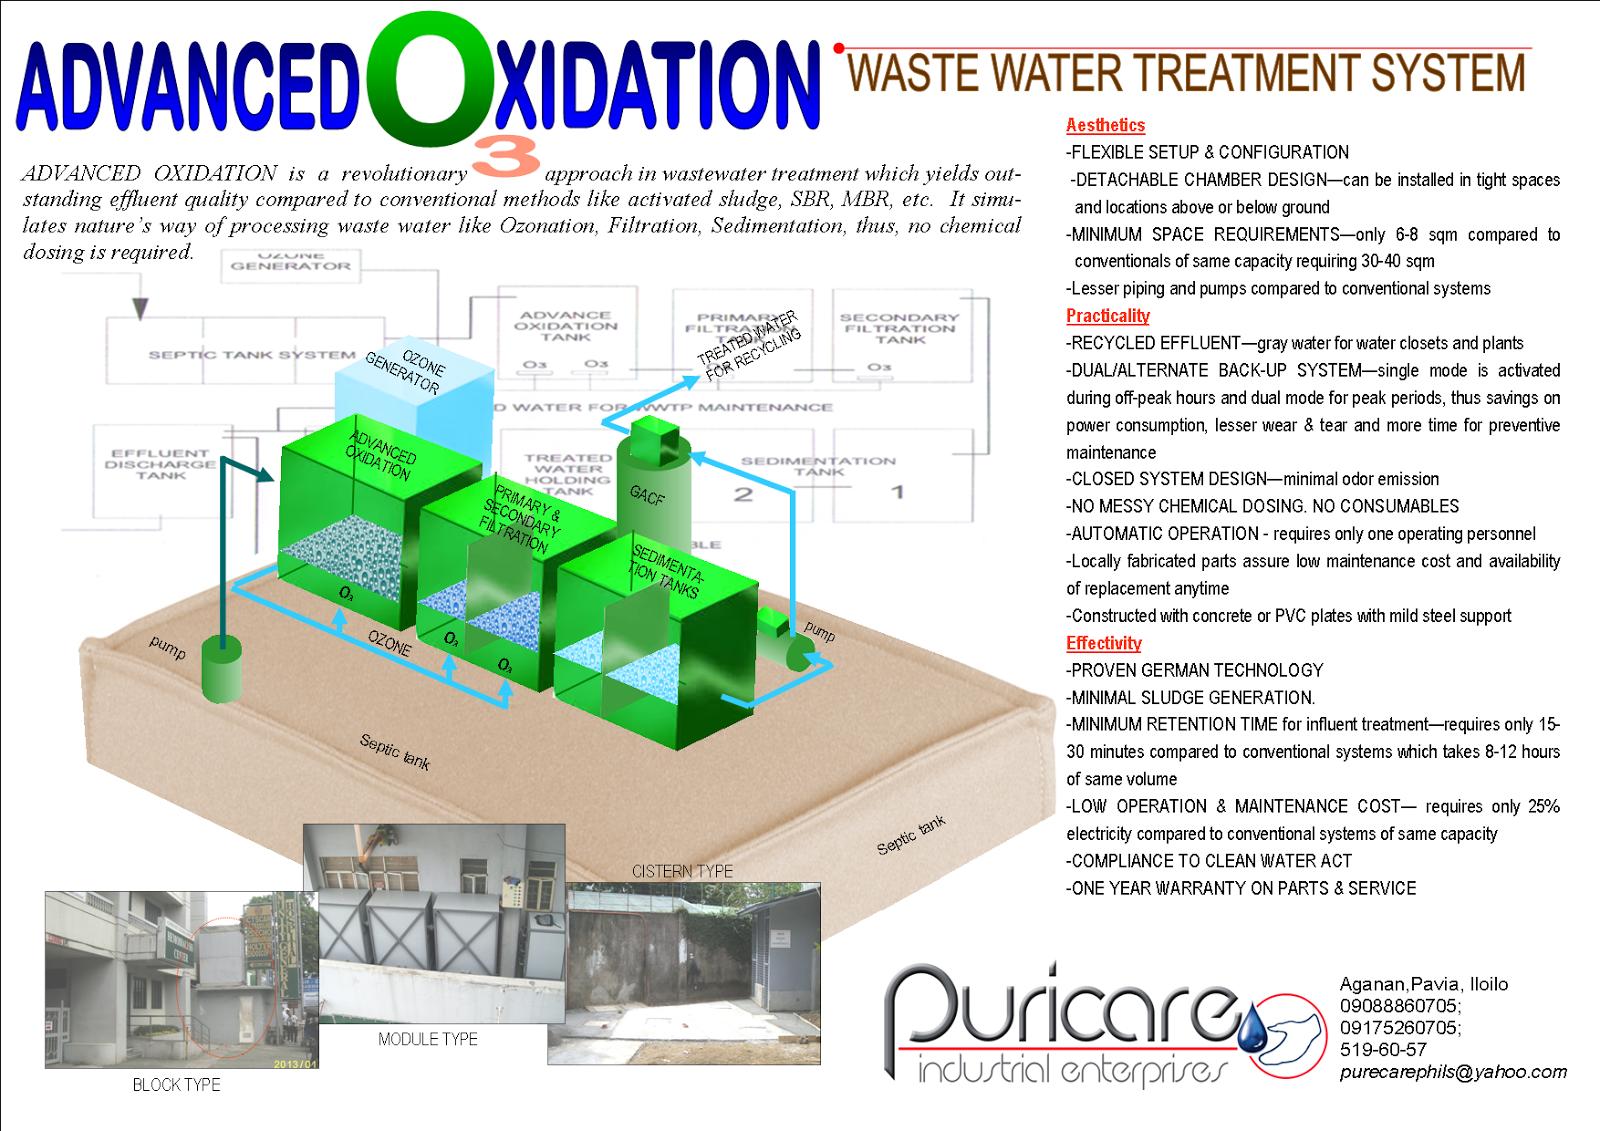 Puricare Industrial Enterprises Advanced Oxidation Waste